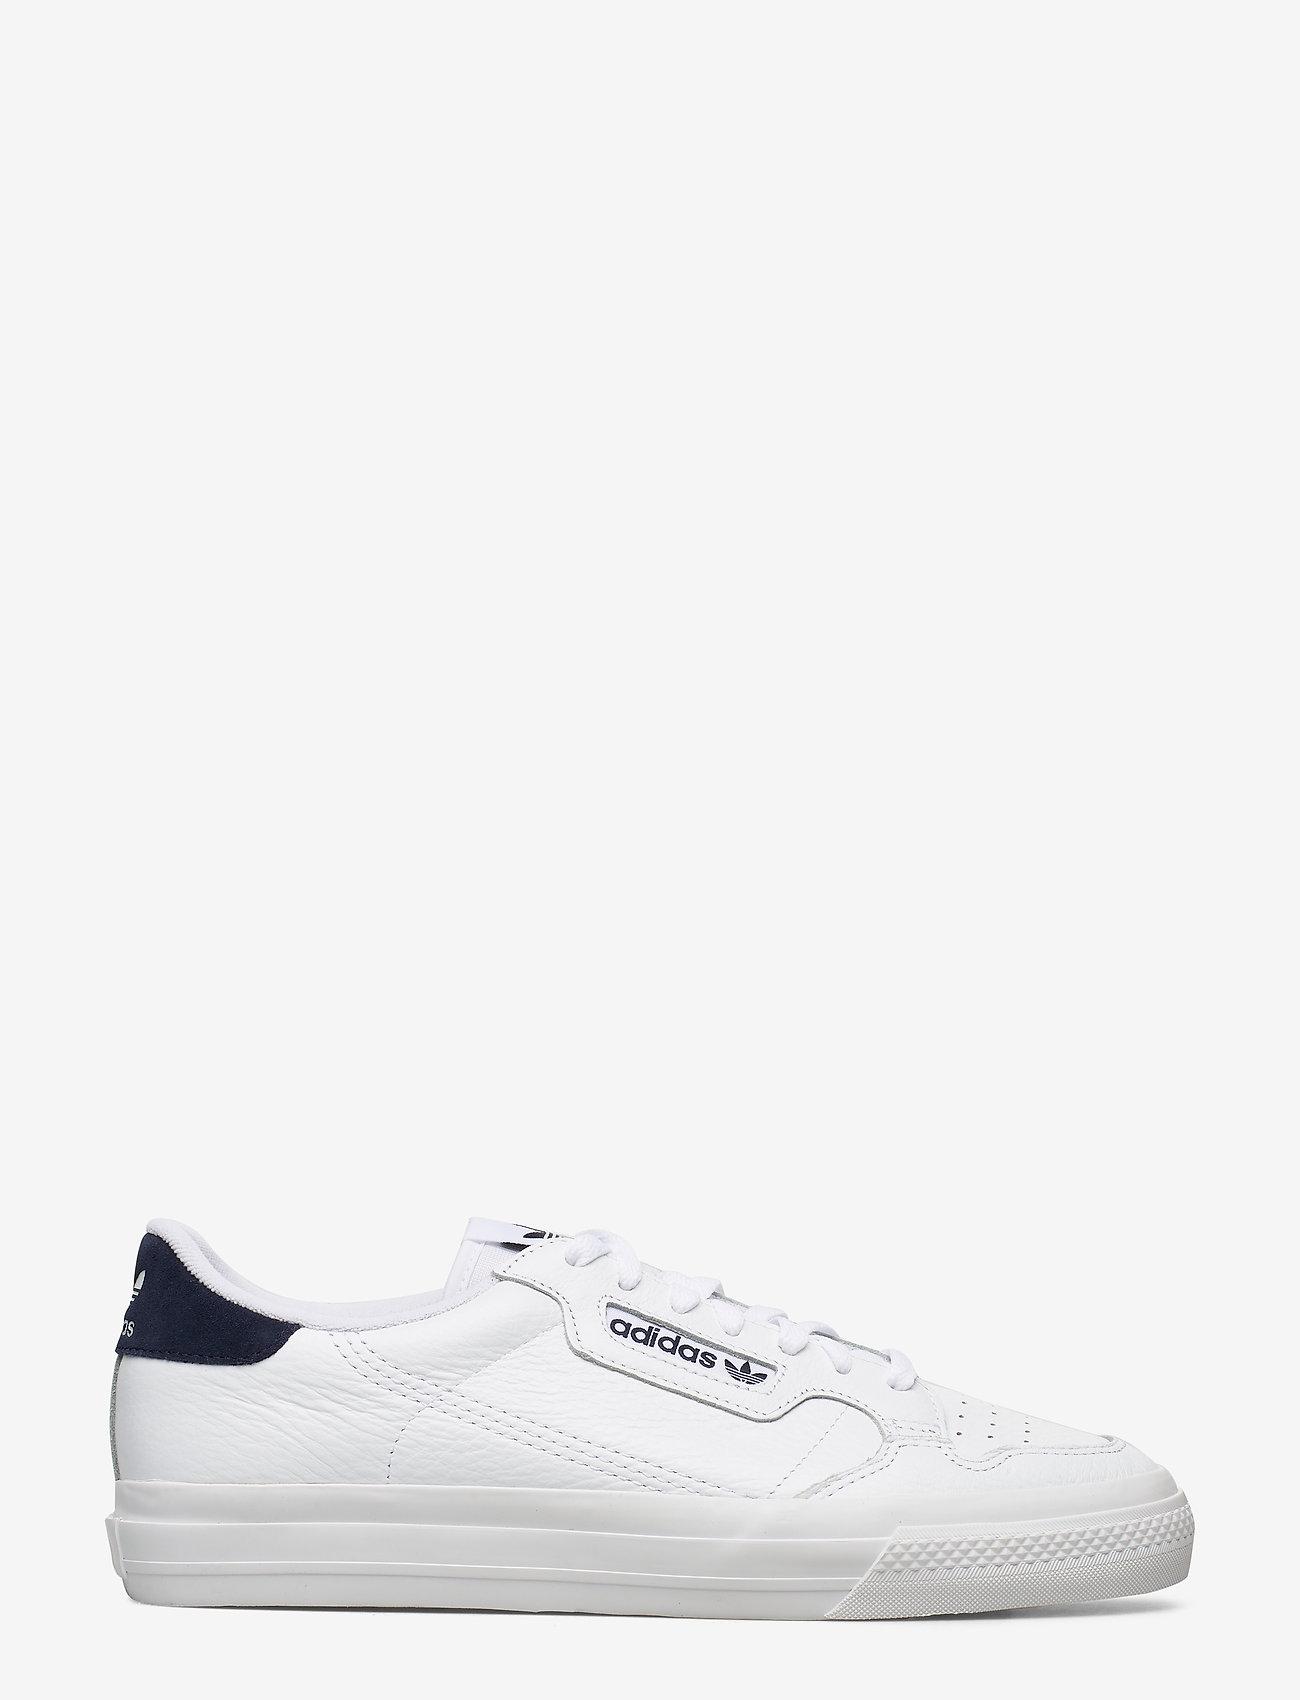 adidas Originals - CONTINENTAL VULC - lave sneakers - ftwwht/ftwwht/conavy - 1